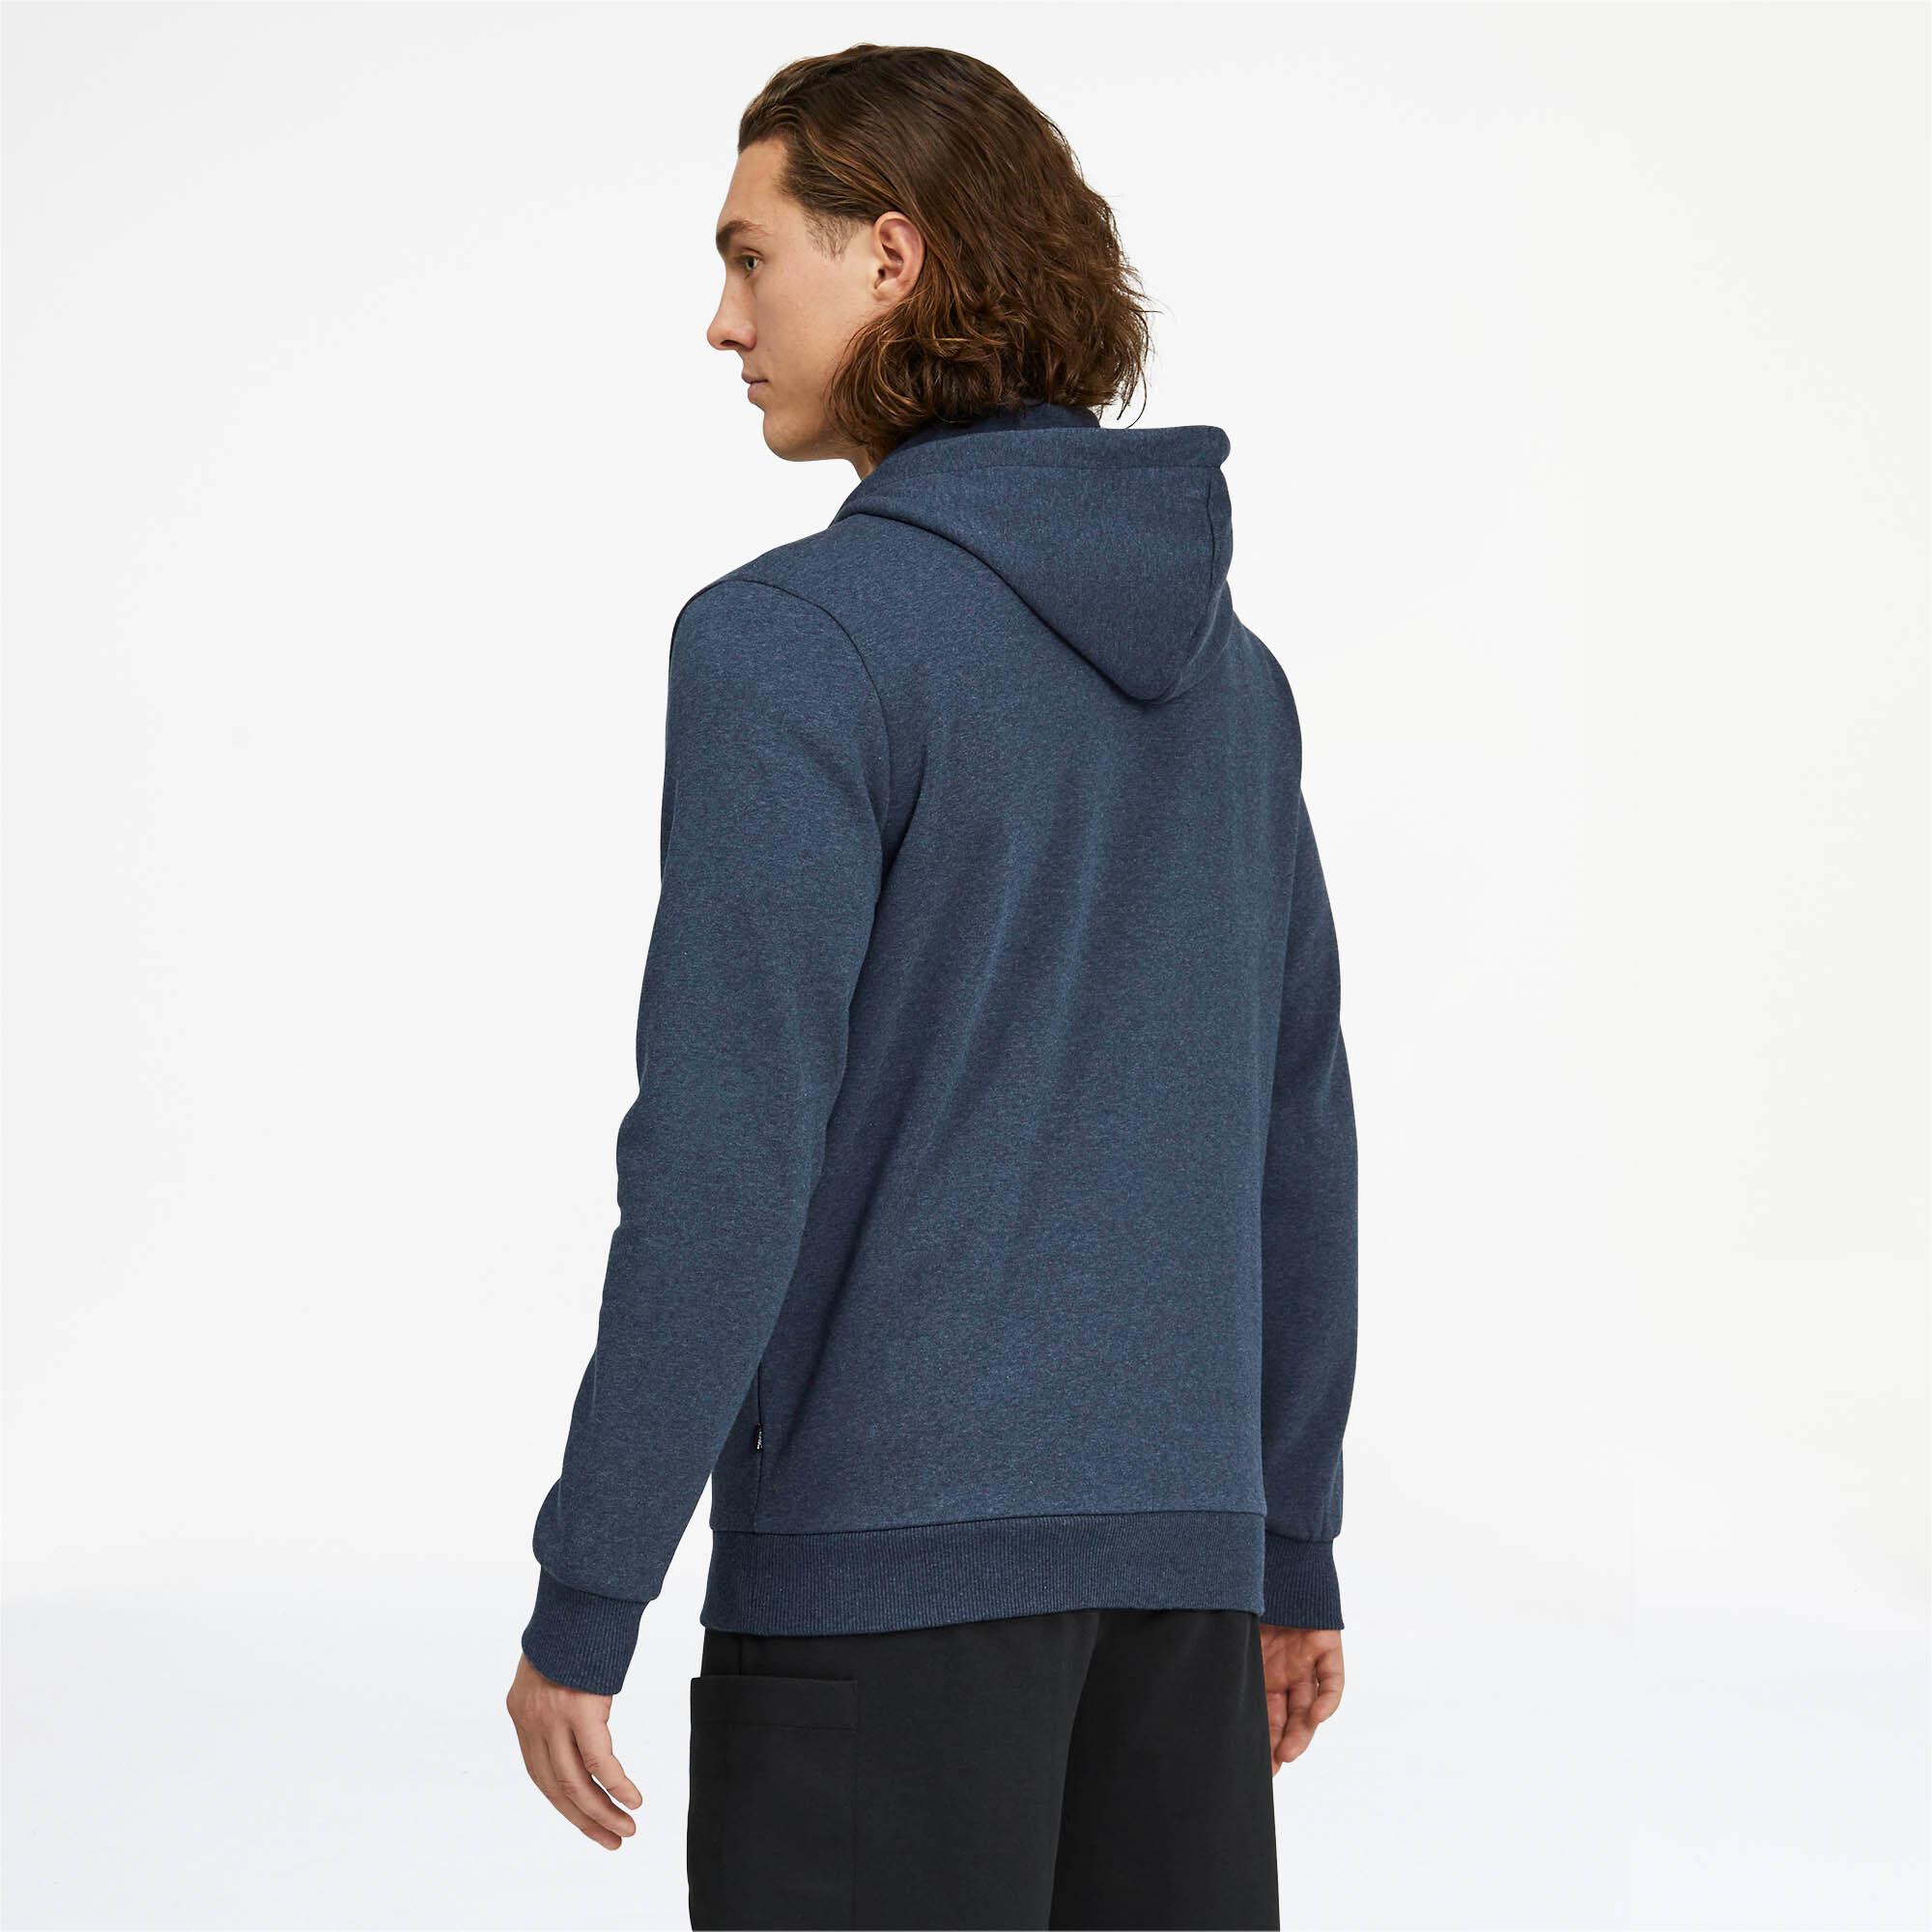 PUMA-Essentials-Men-039-s-Fleece-Hooded-Jacket-Men-Sweat-Basics thumbnail 5